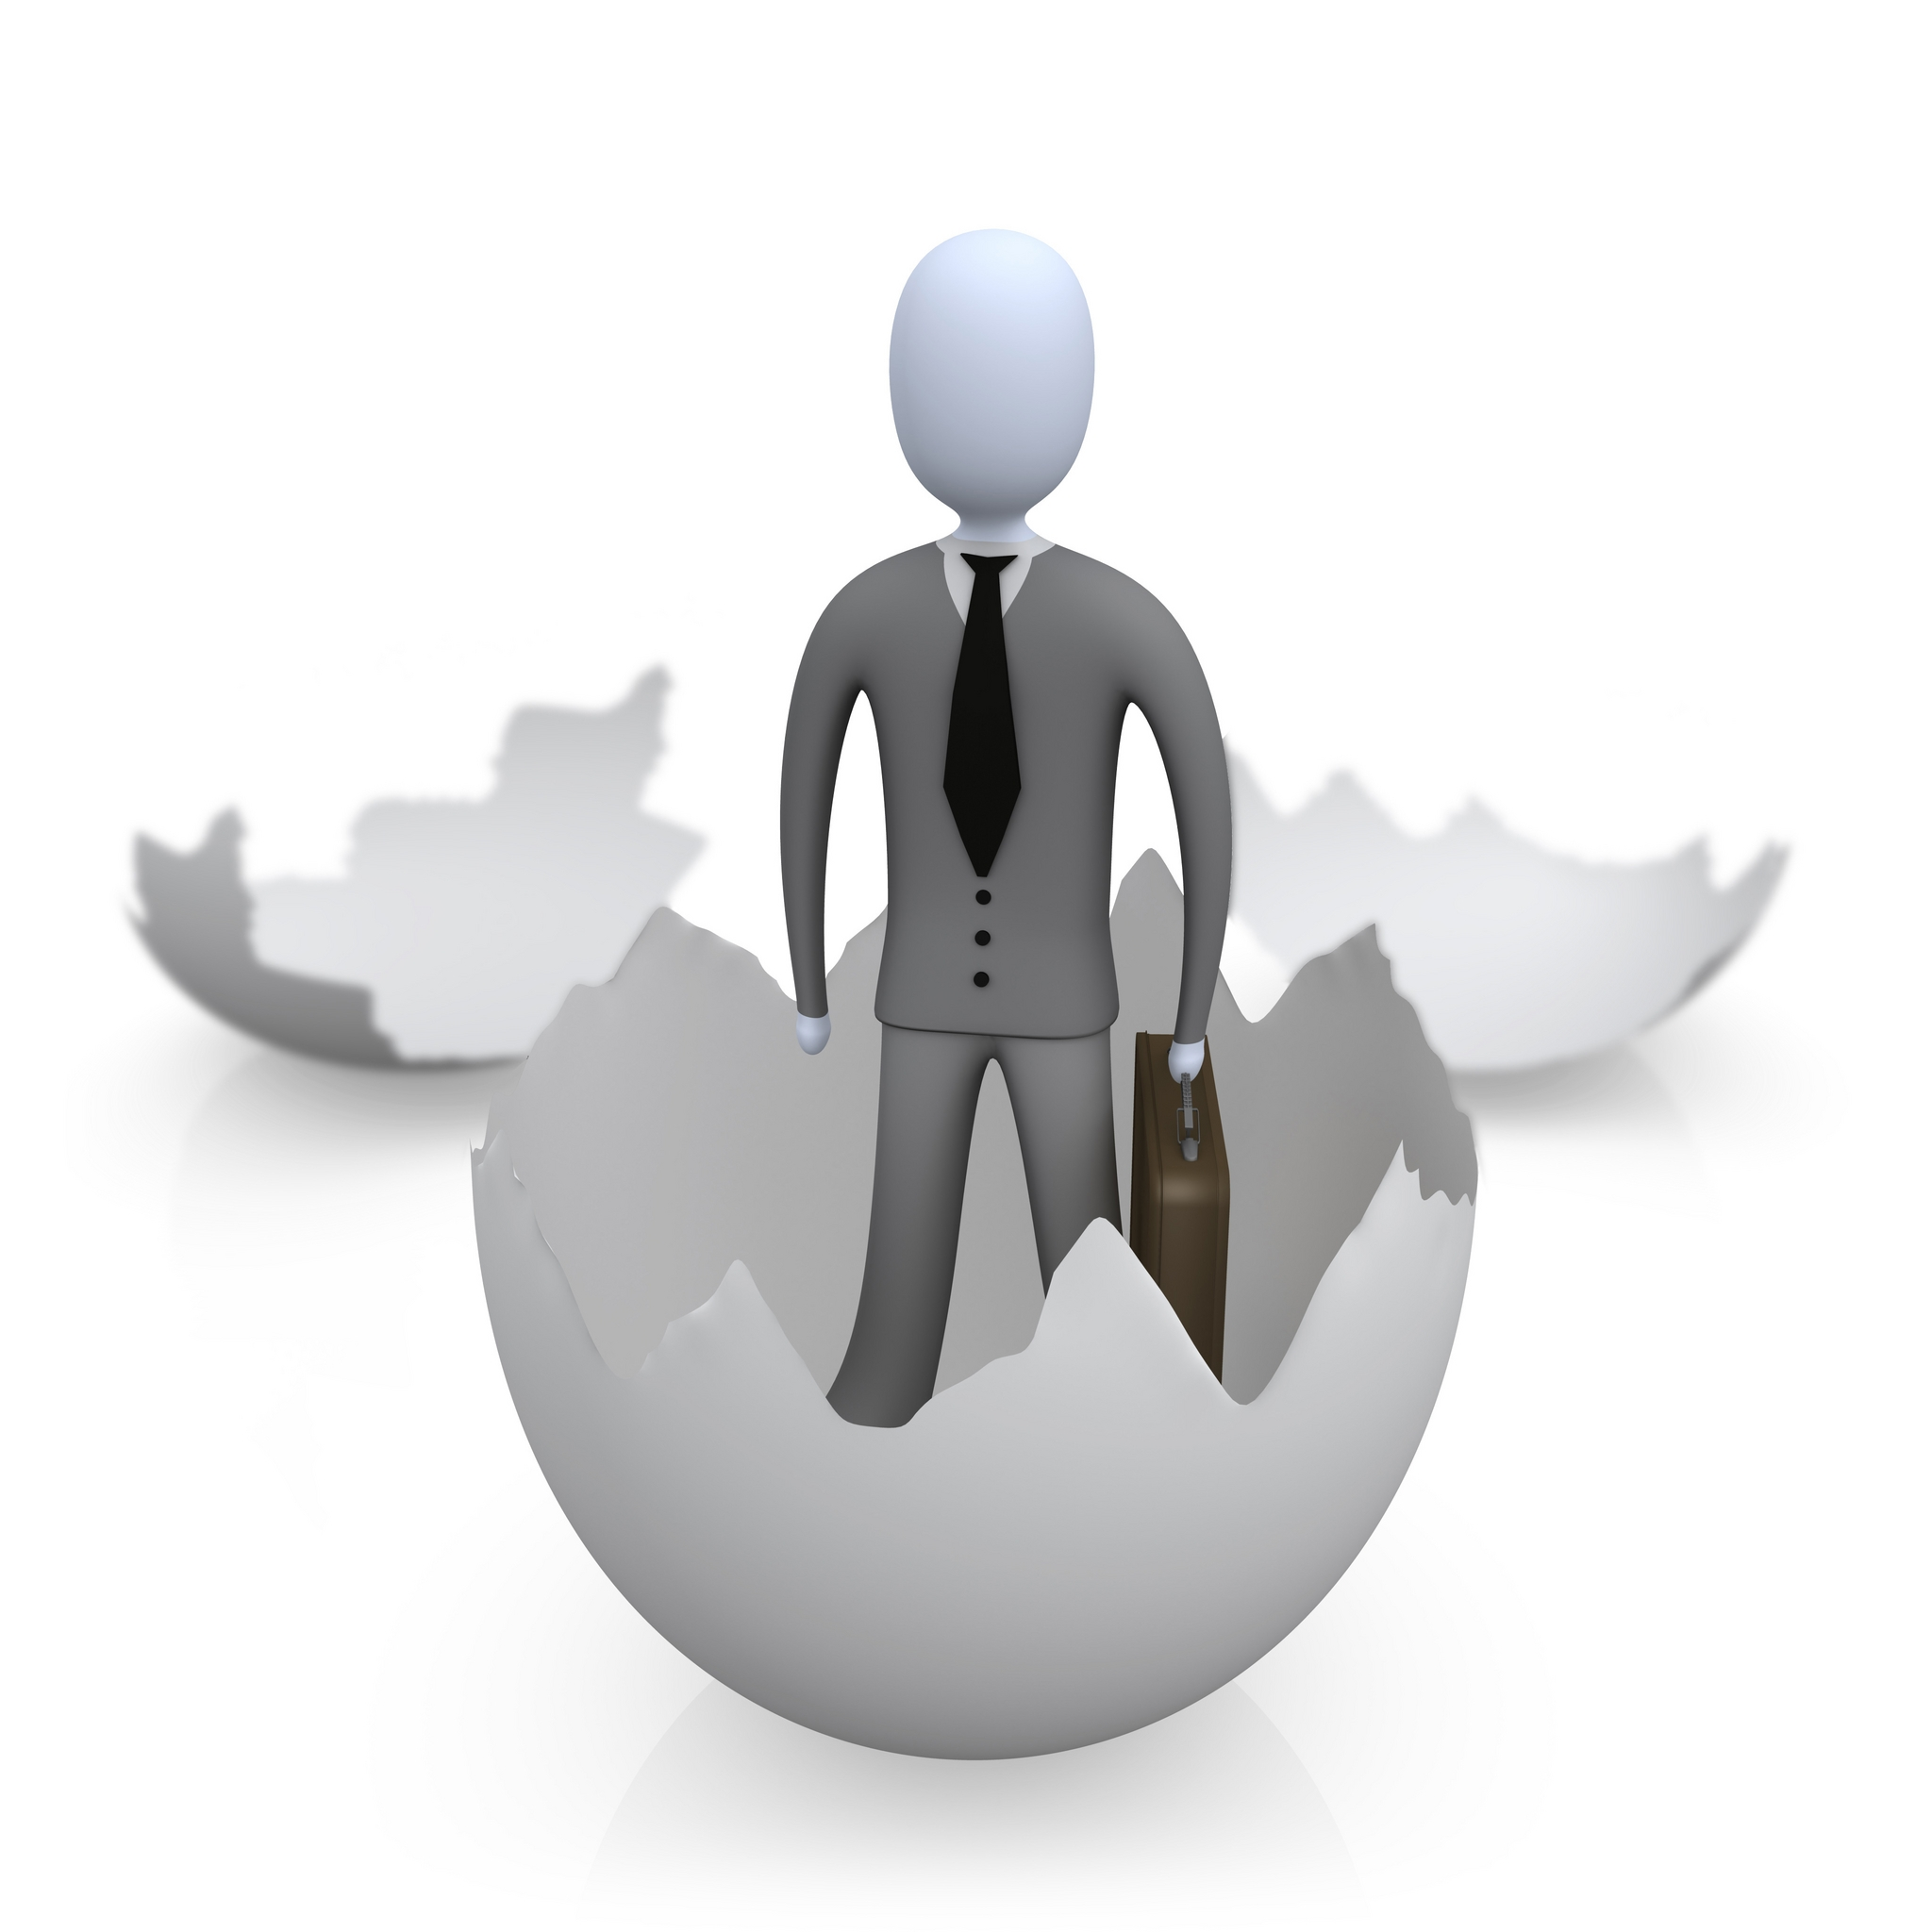 Business clipart business management #4